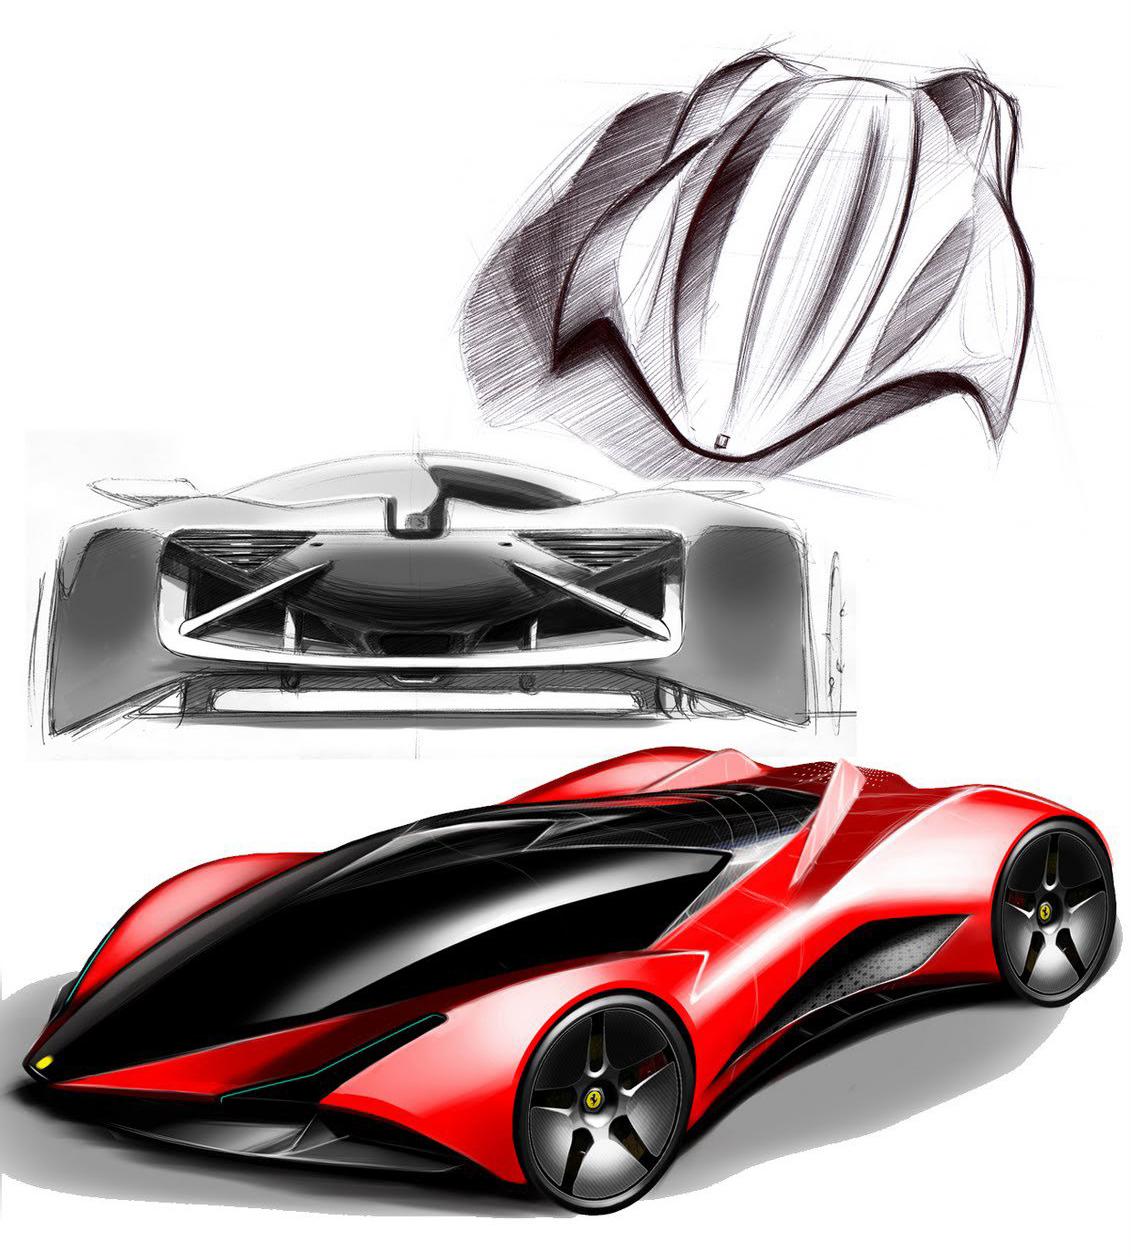 Ferrari Designer: Awesome Designs For The 'Ferrari World Design' Contest